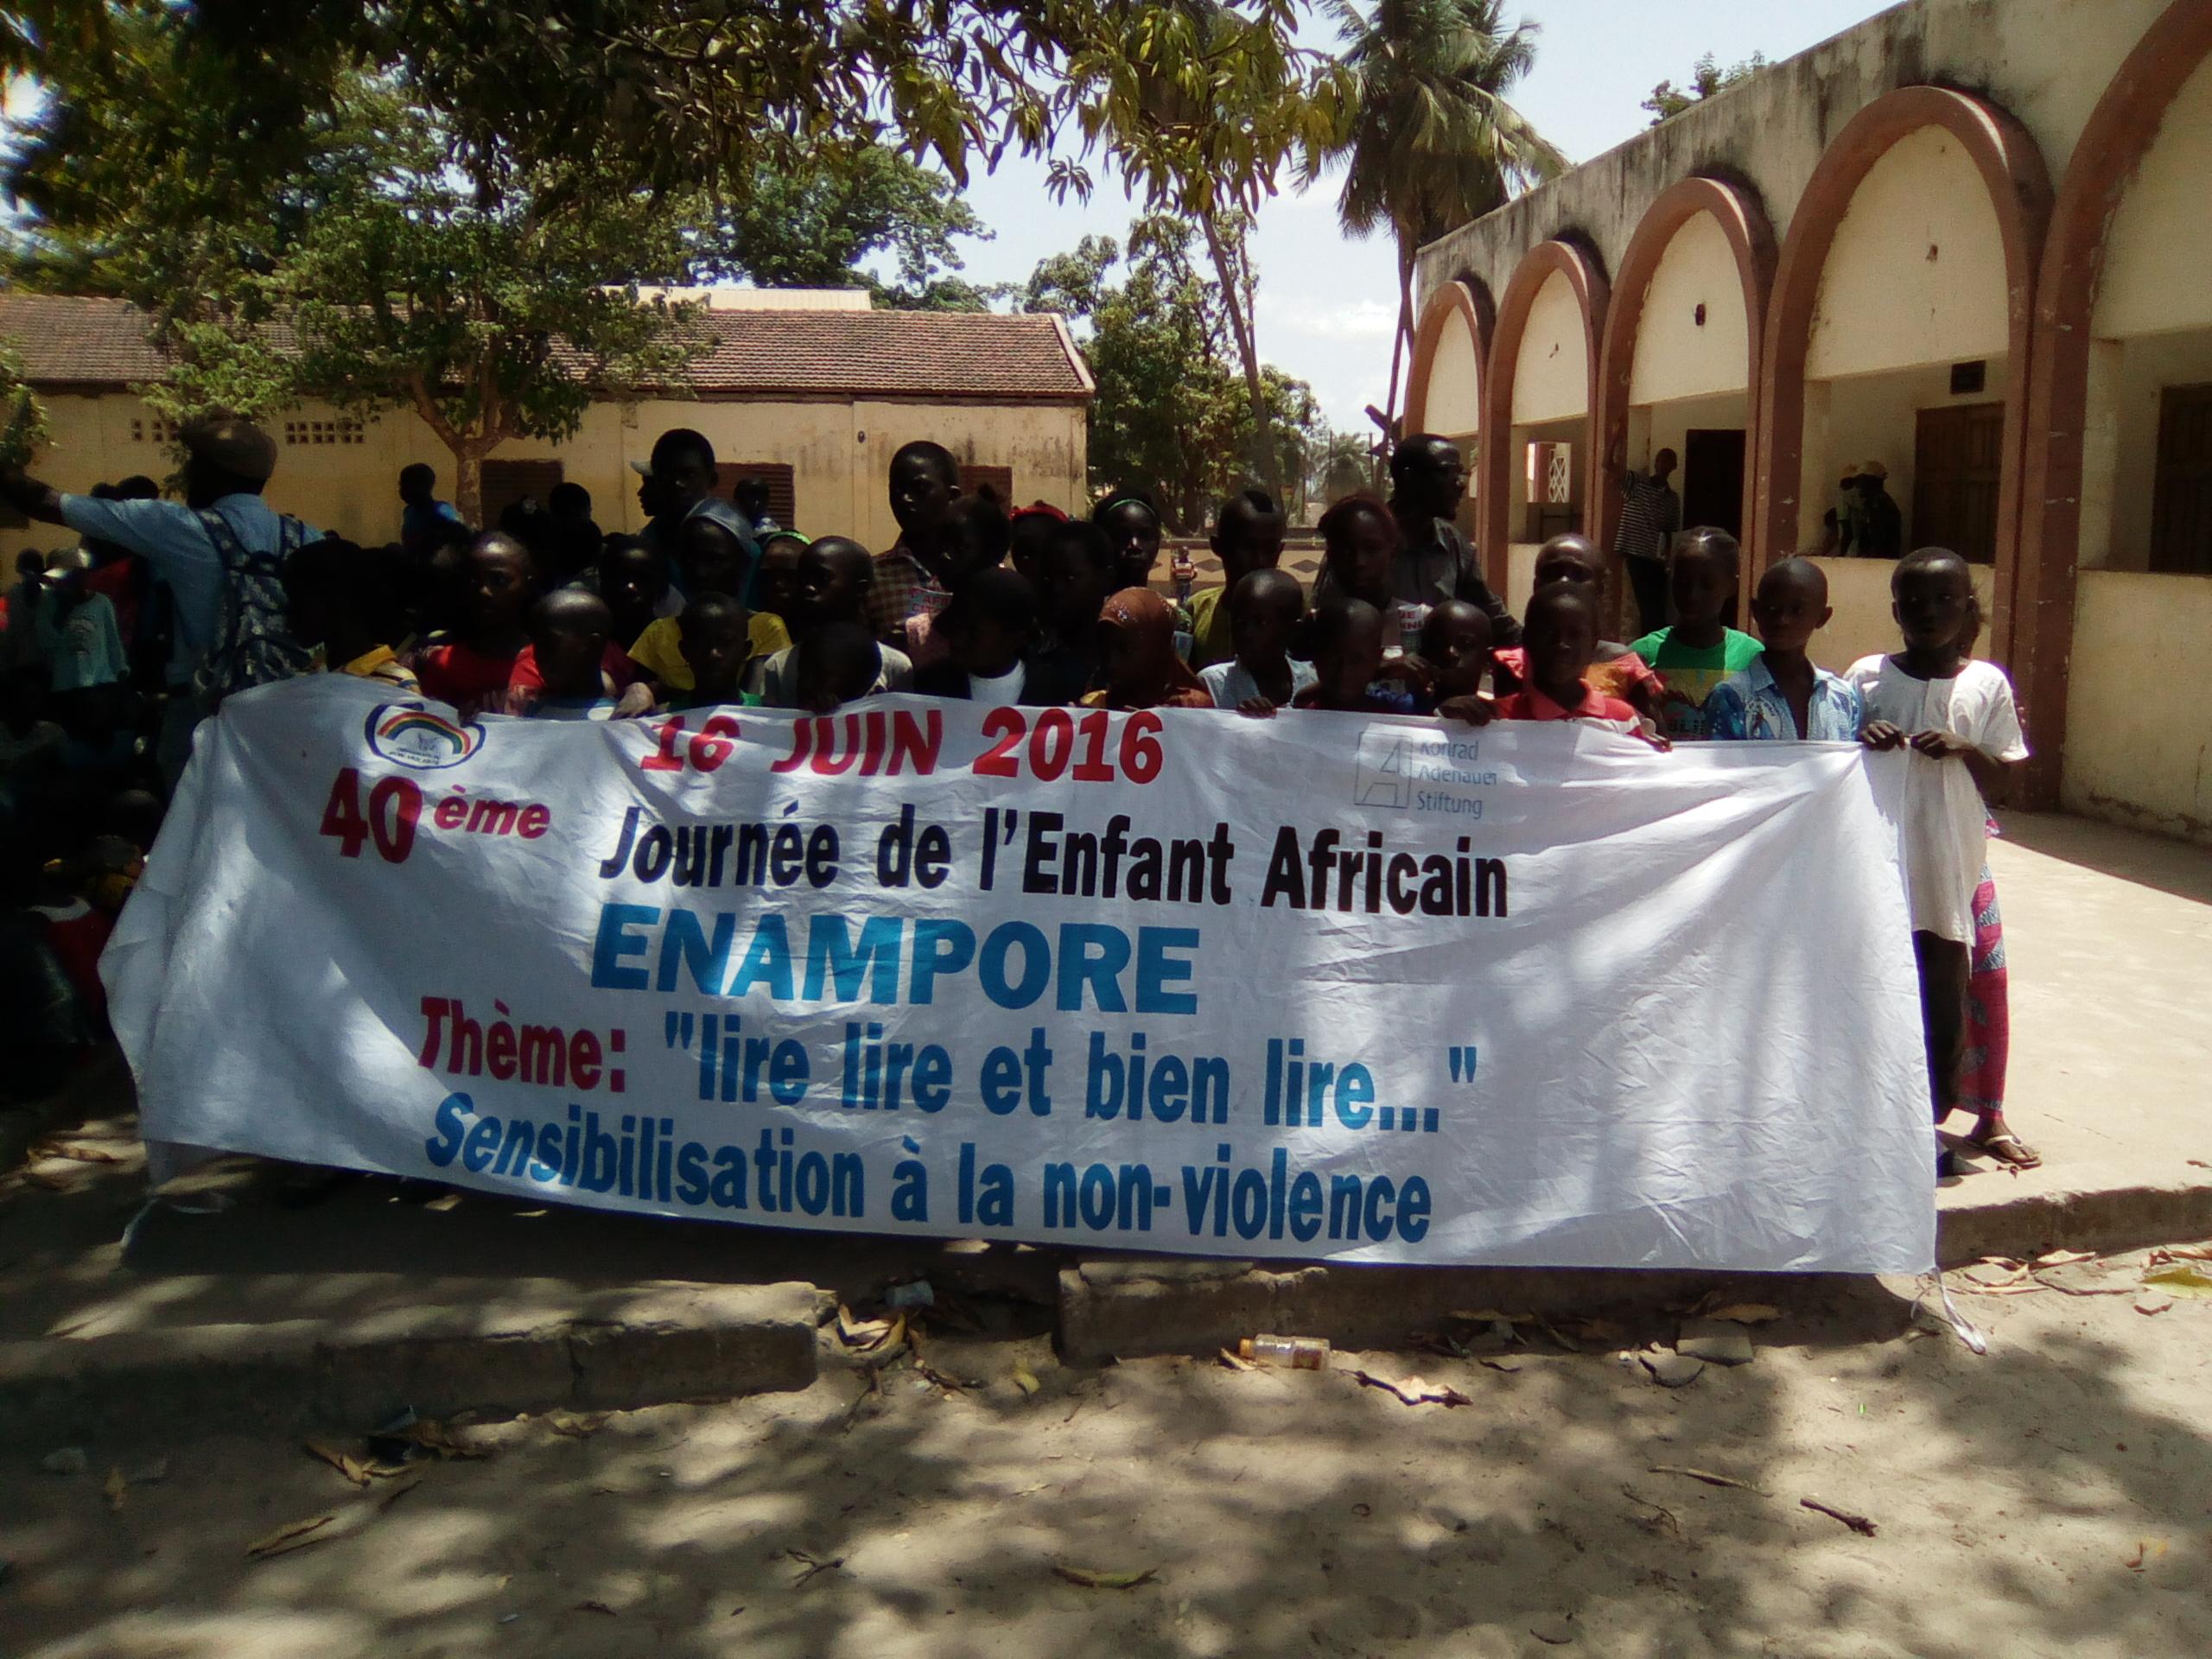 Journe-de-lEnfant-Africain